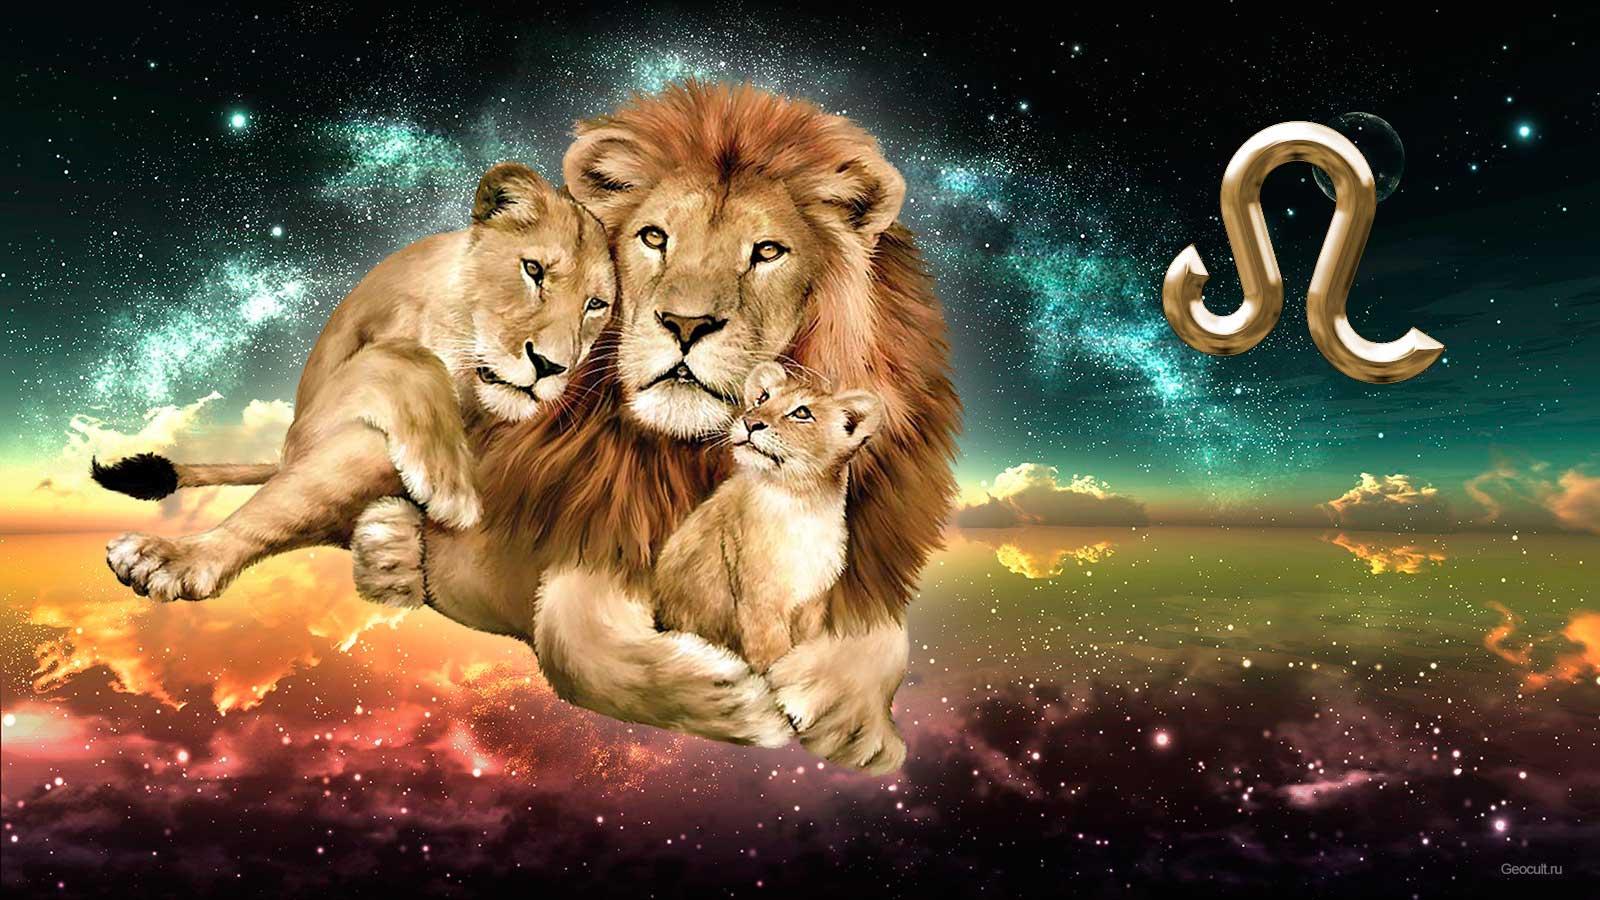 О сексе с мужчиной львом